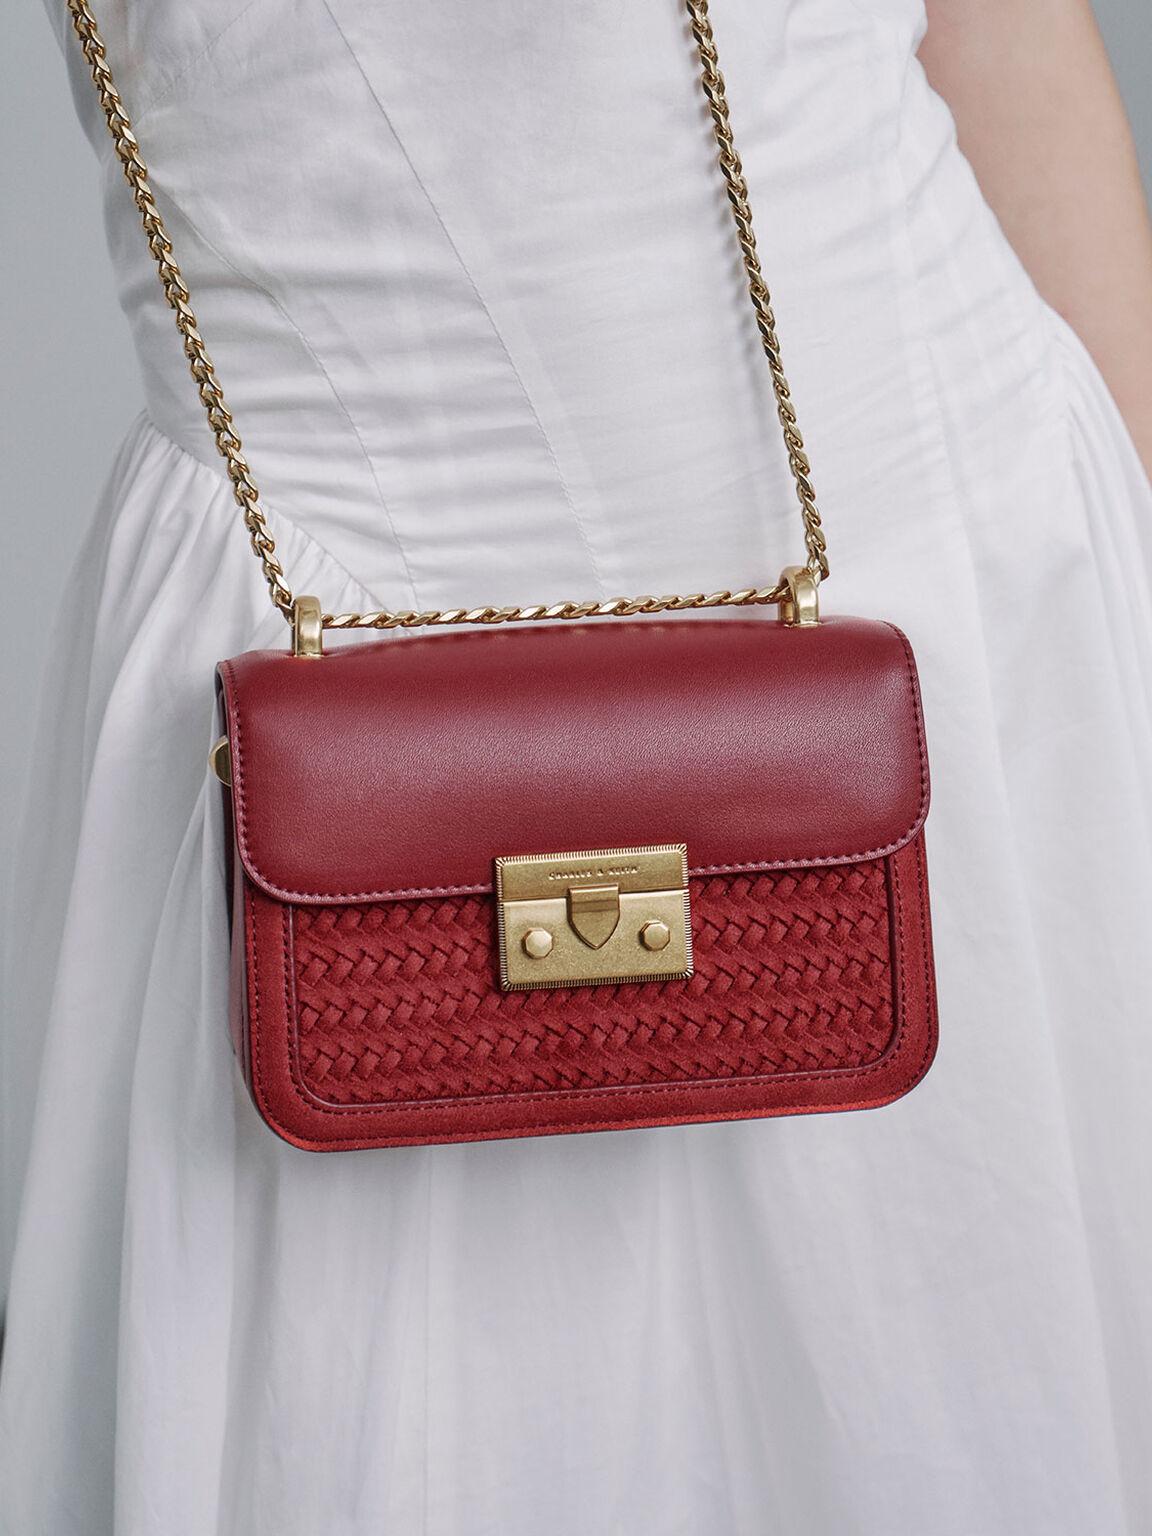 Textured Metallic Push-Lock Crossbody Bag, Red, hi-res